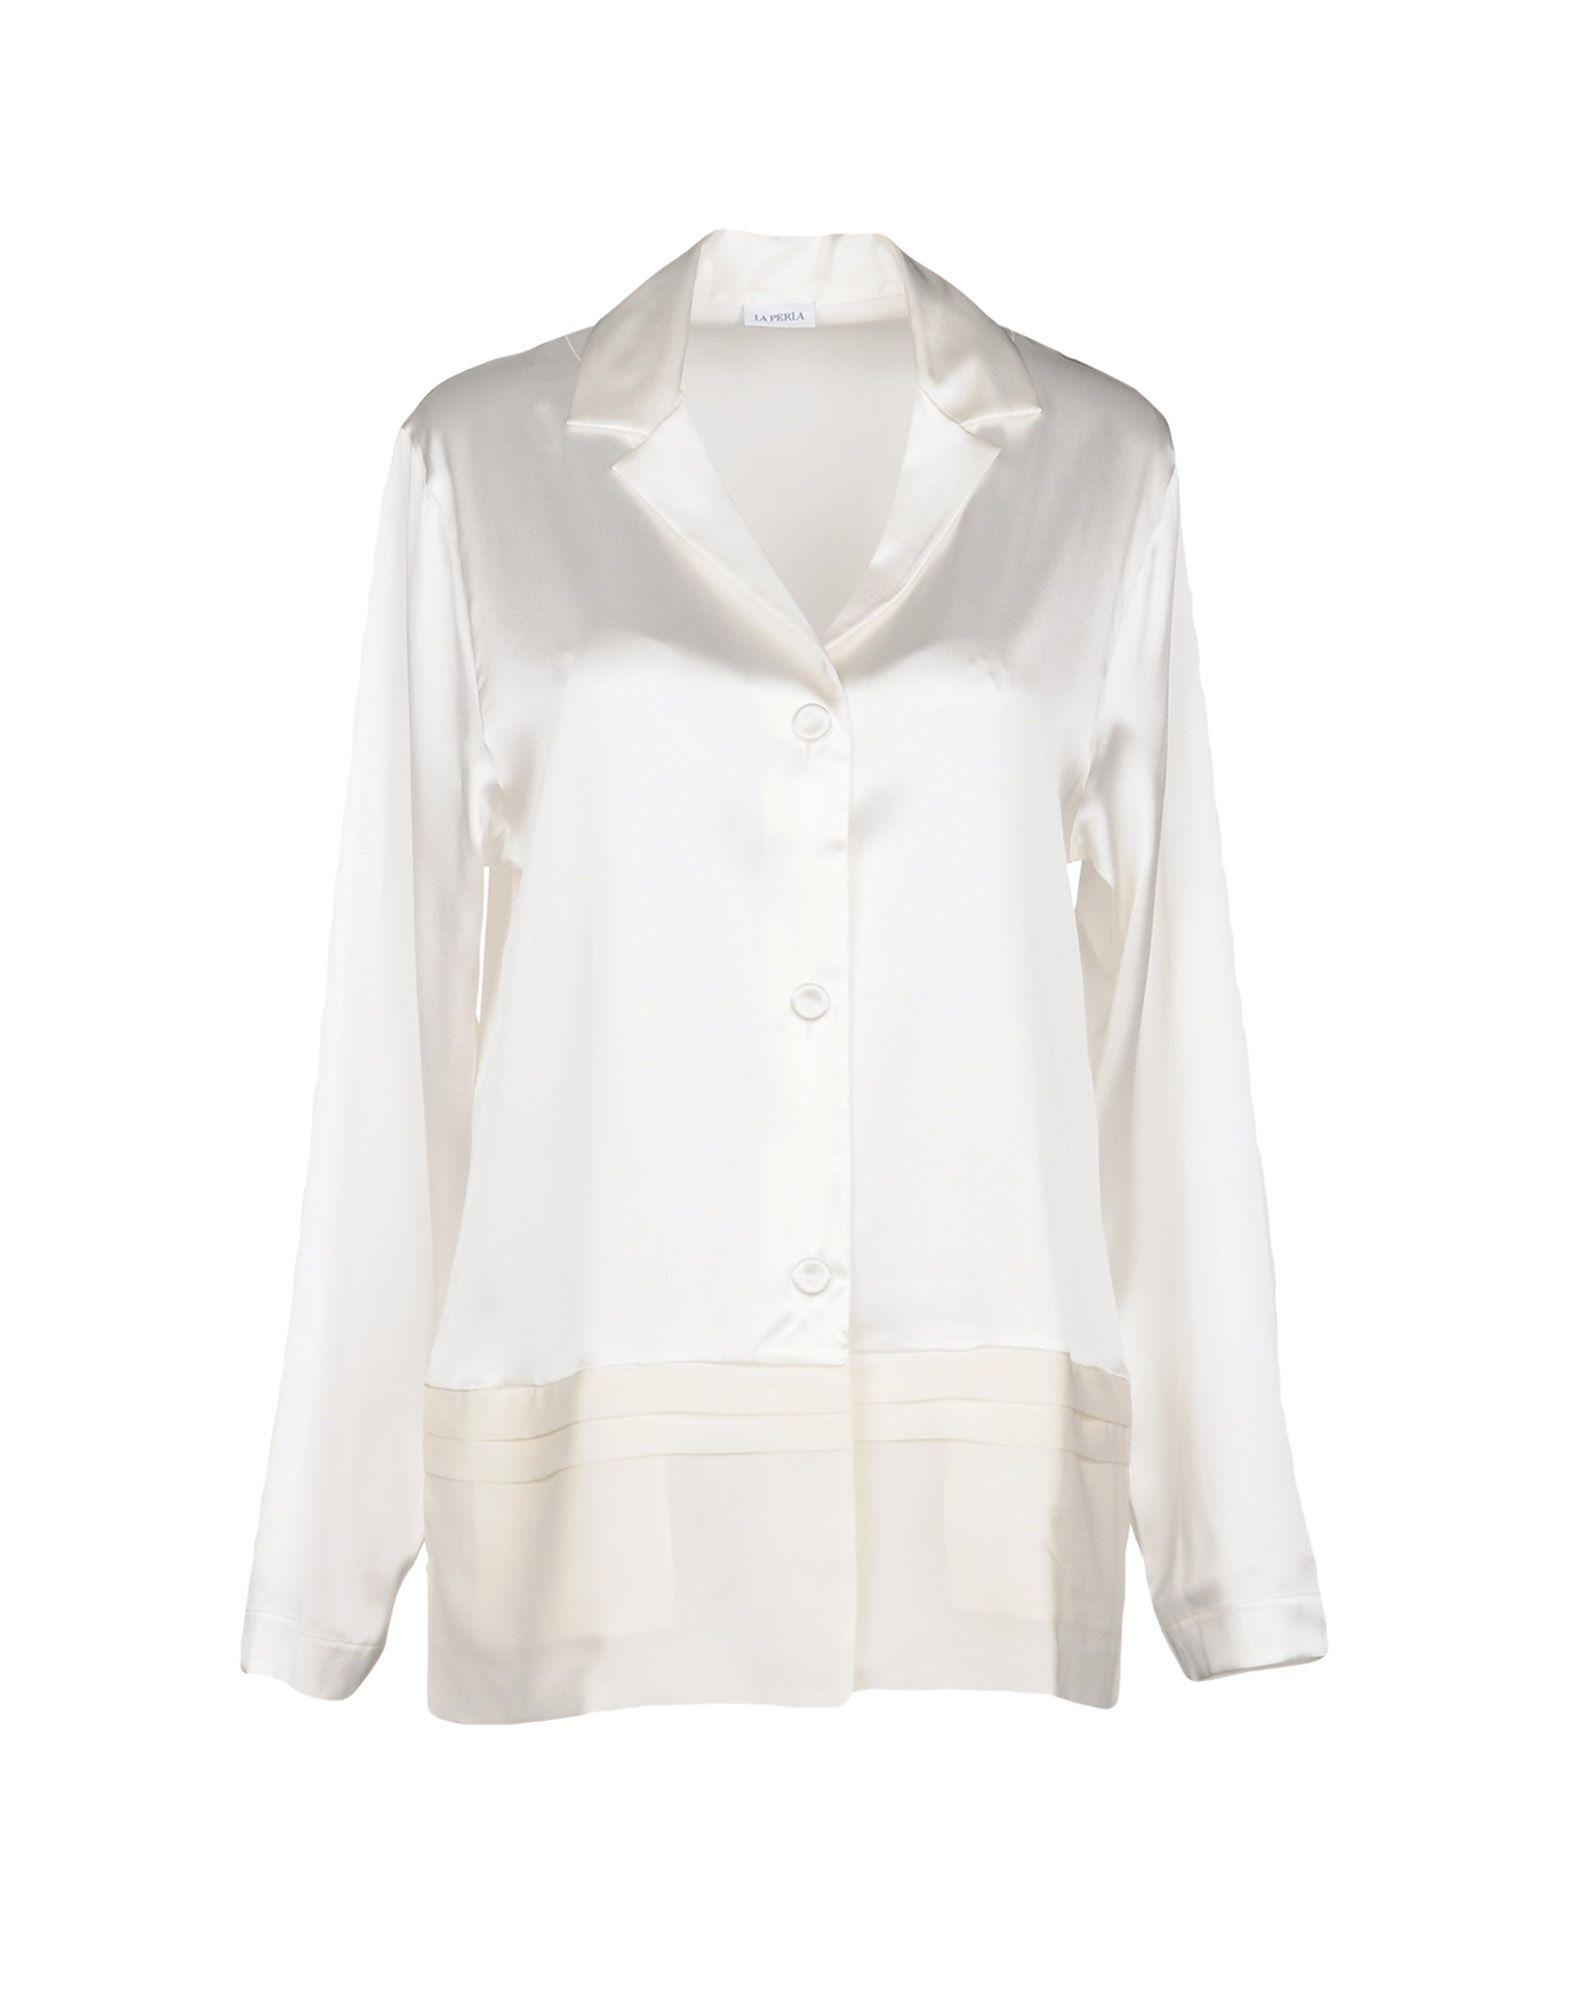 LA PERLA Ночная рубашка рубашка ночная с макраме